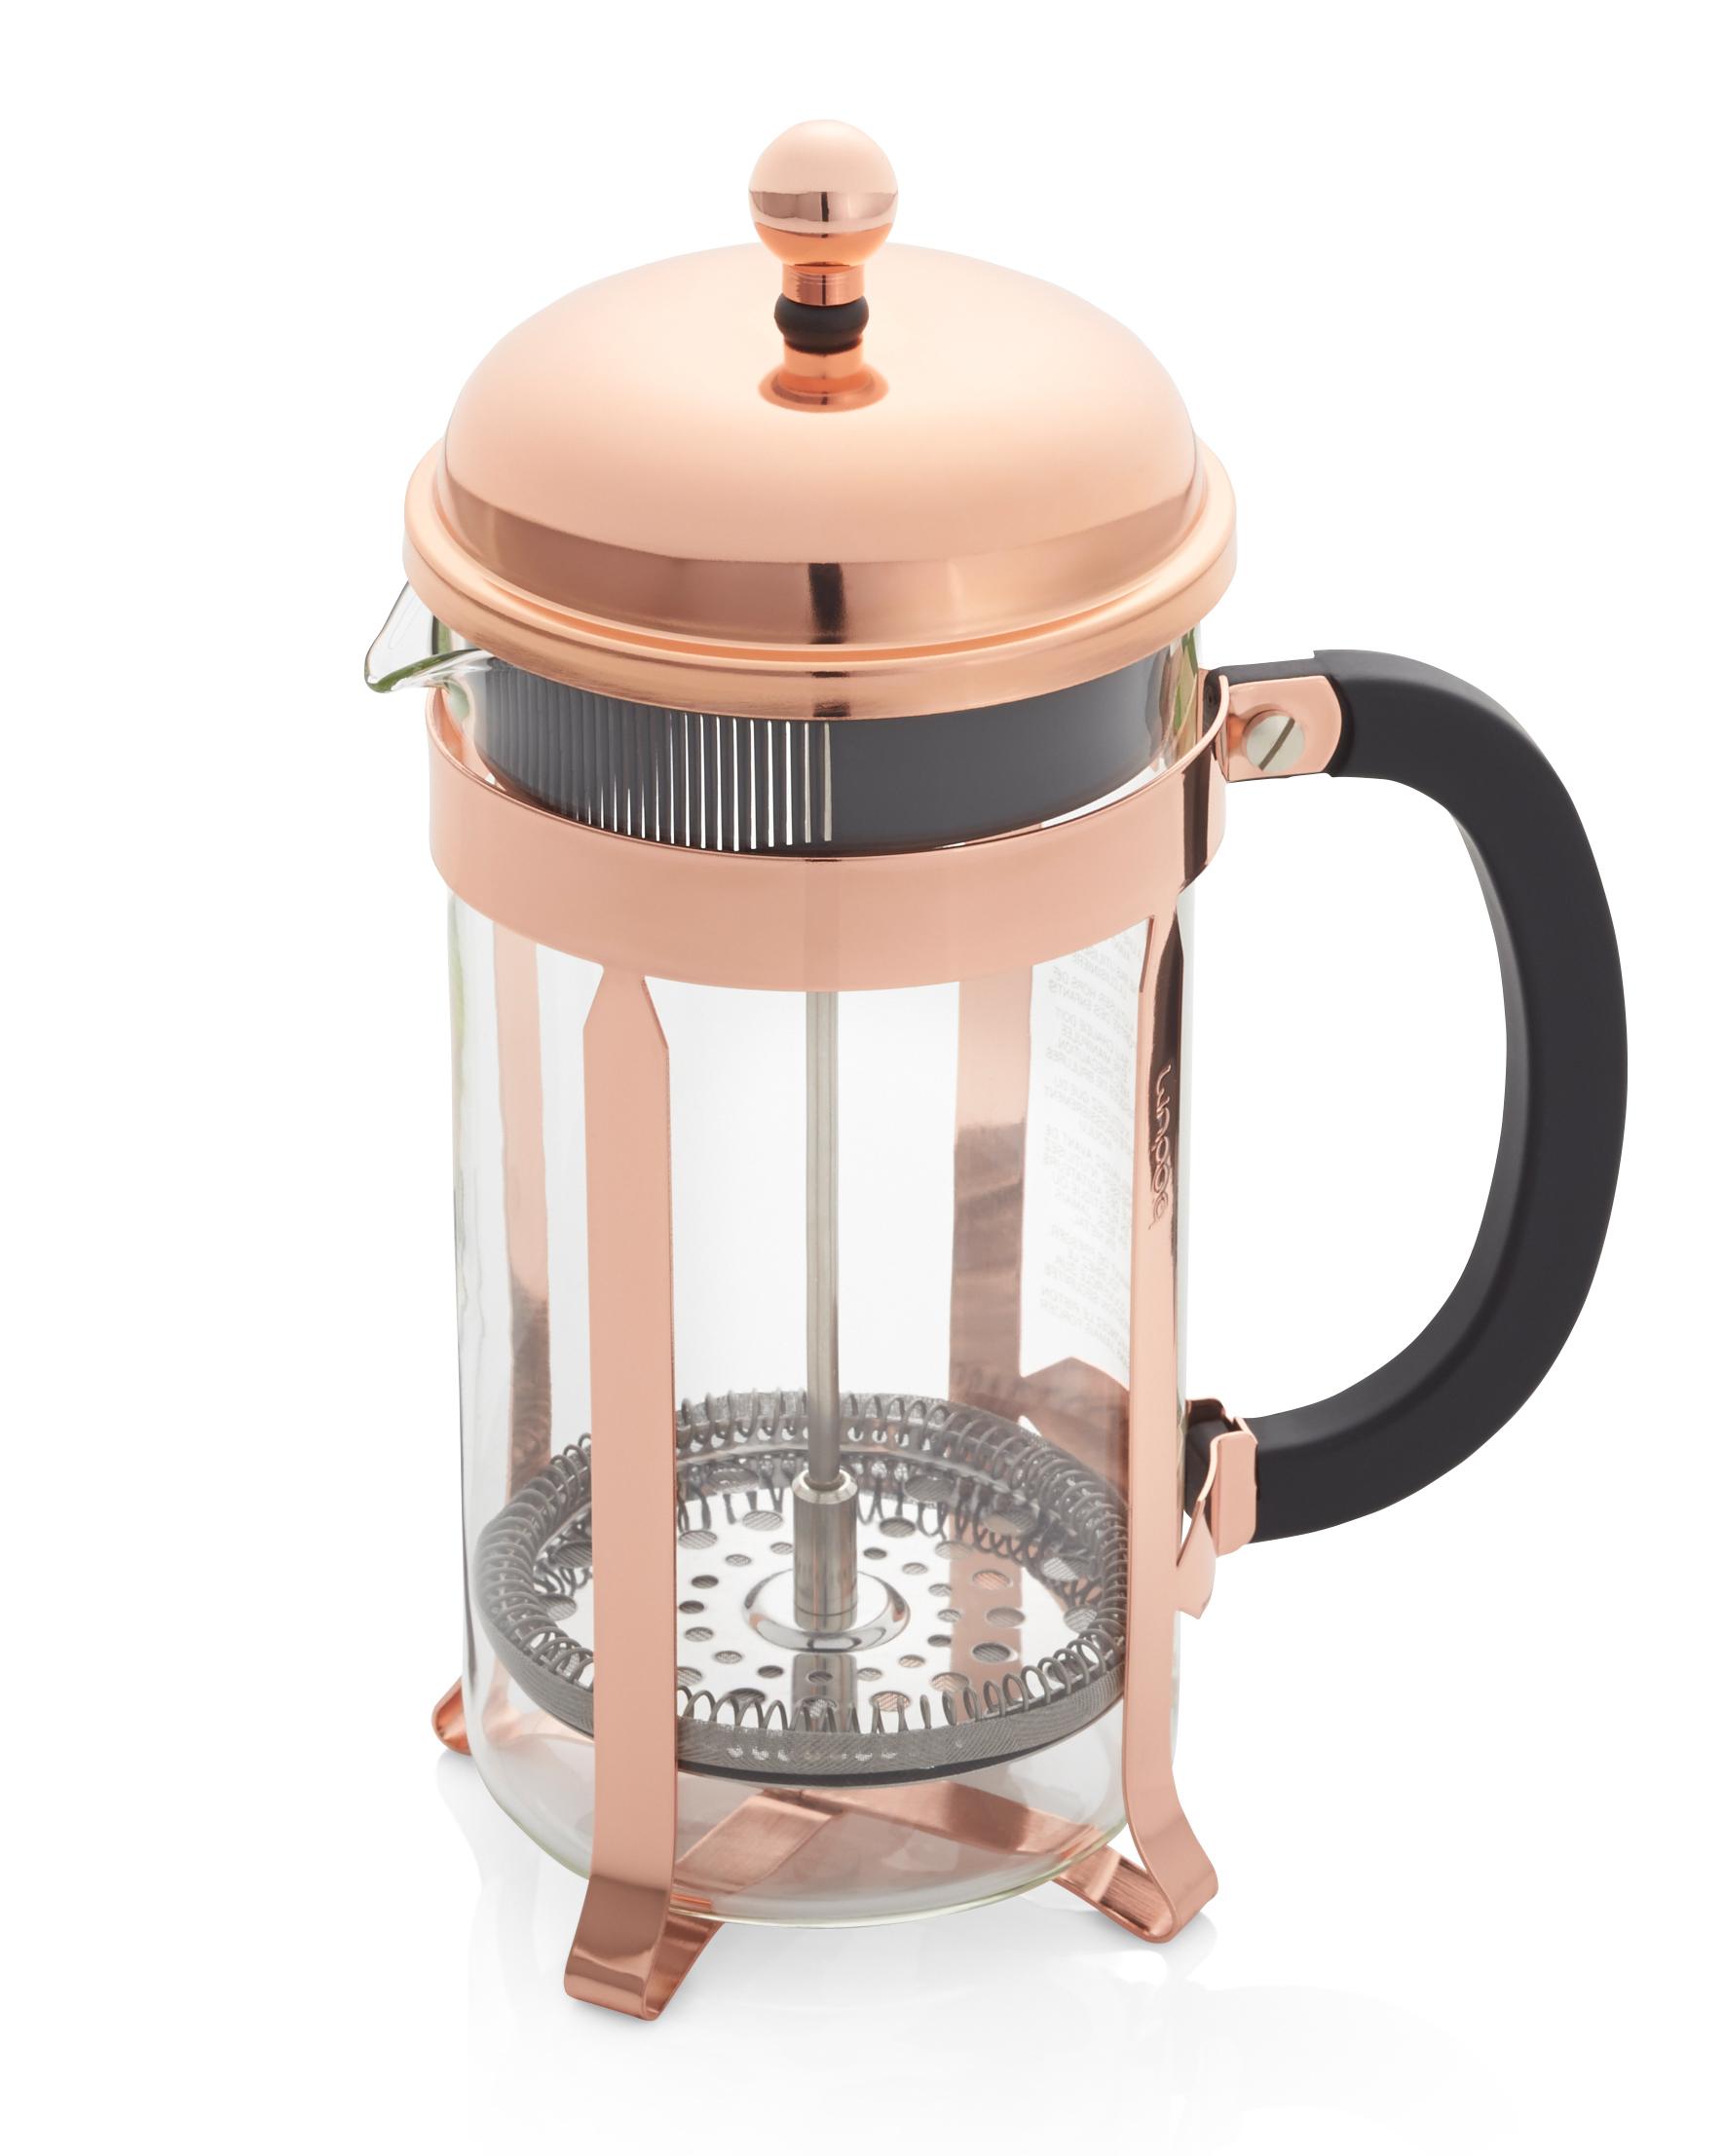 copper-registry-bodum-chambord-french-press-chambord-0116.jpg